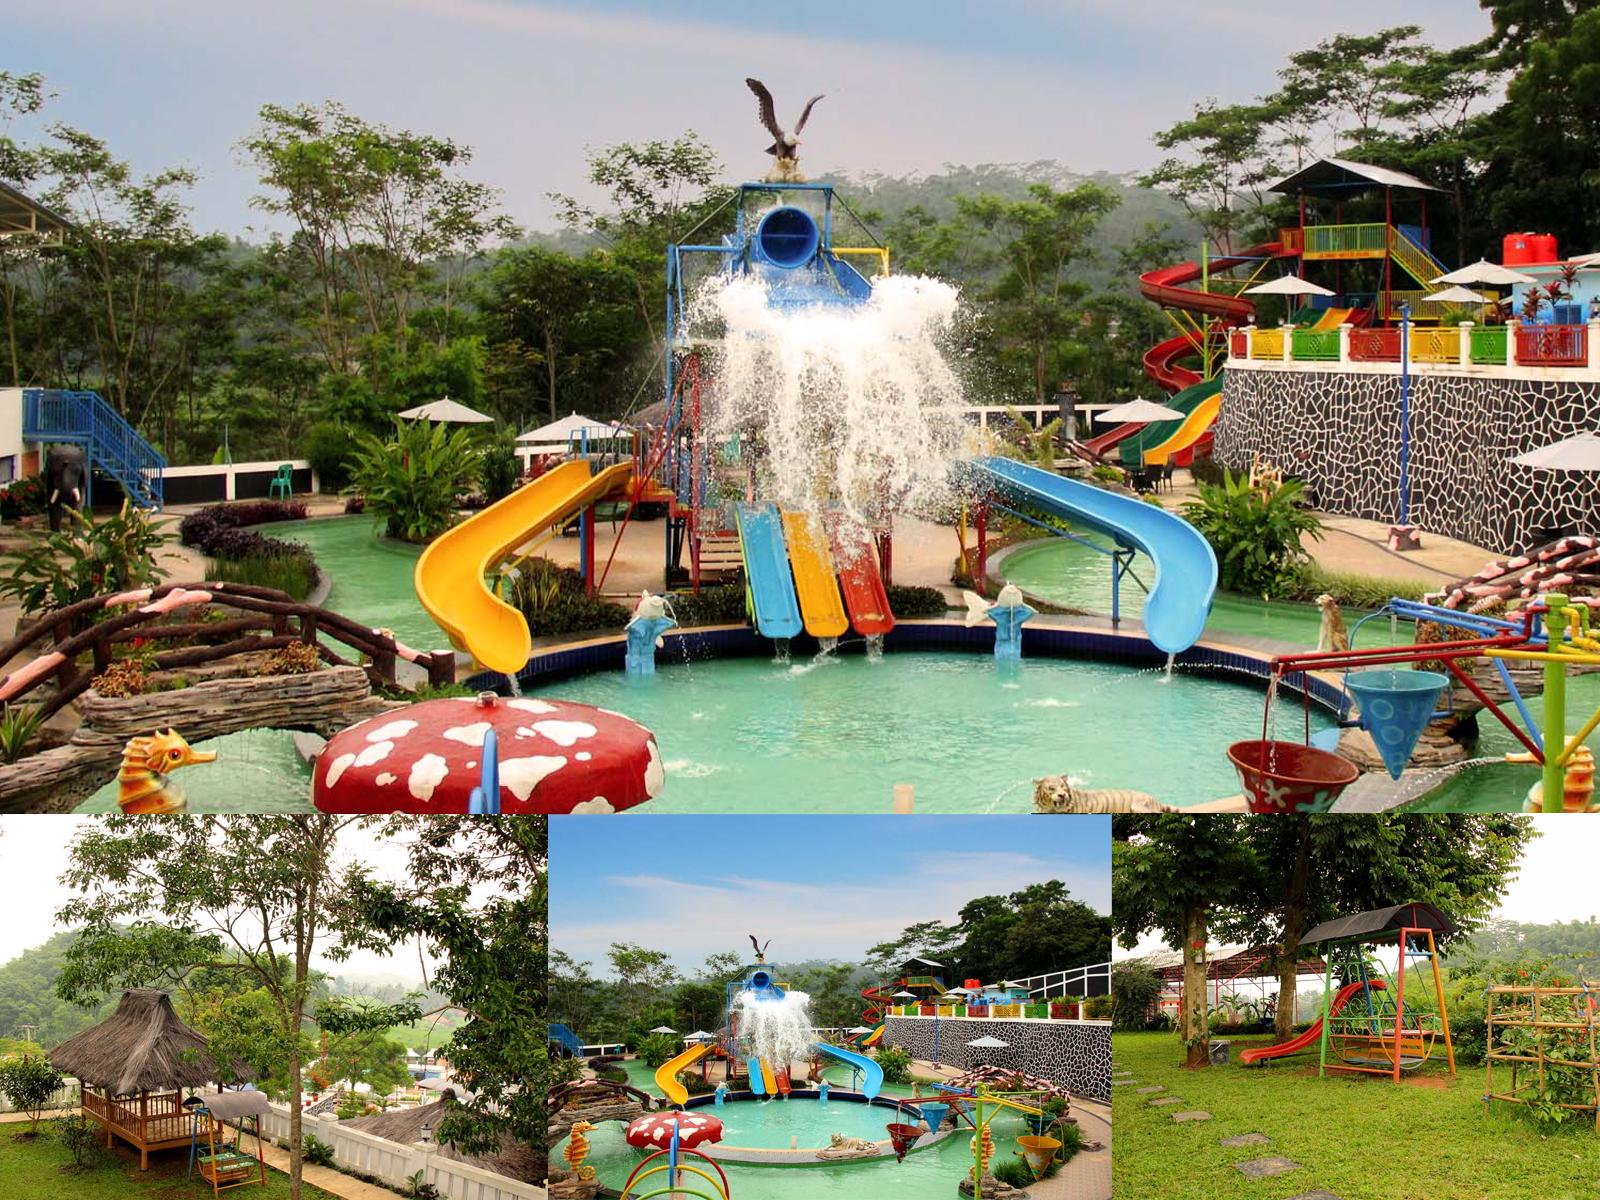 Jajaway Waterpark Cijenuk Kabupaten Bandung Barat